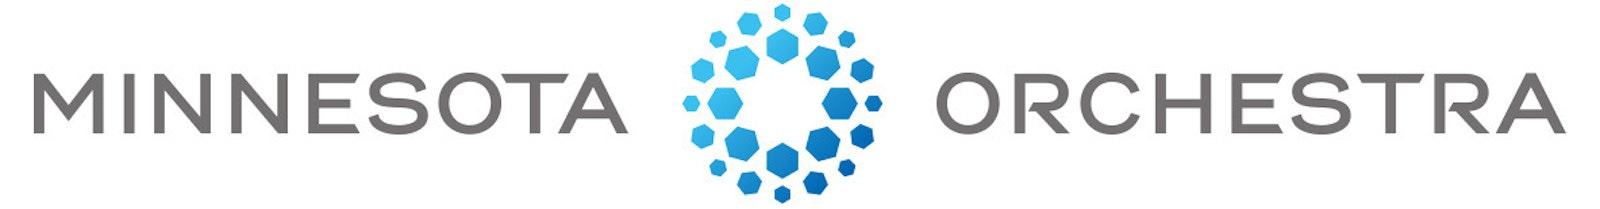 Mn Orchestra logo H